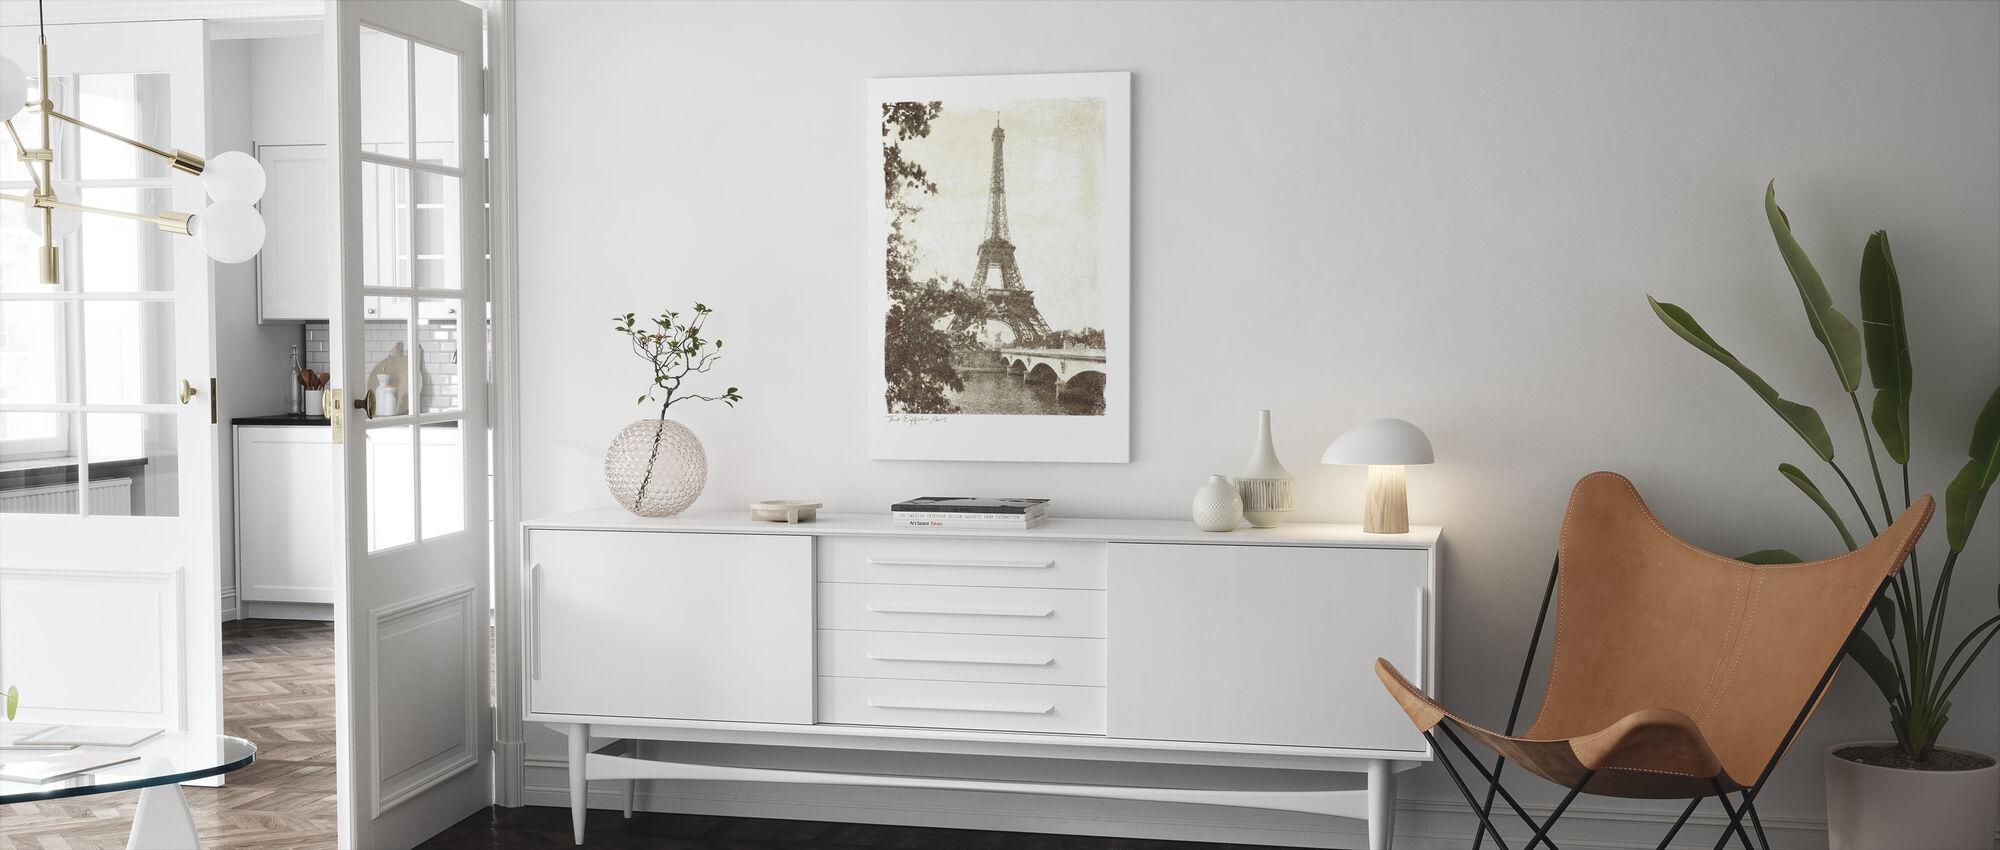 Vintage Eiffel Tower - Canvas print - Living Room